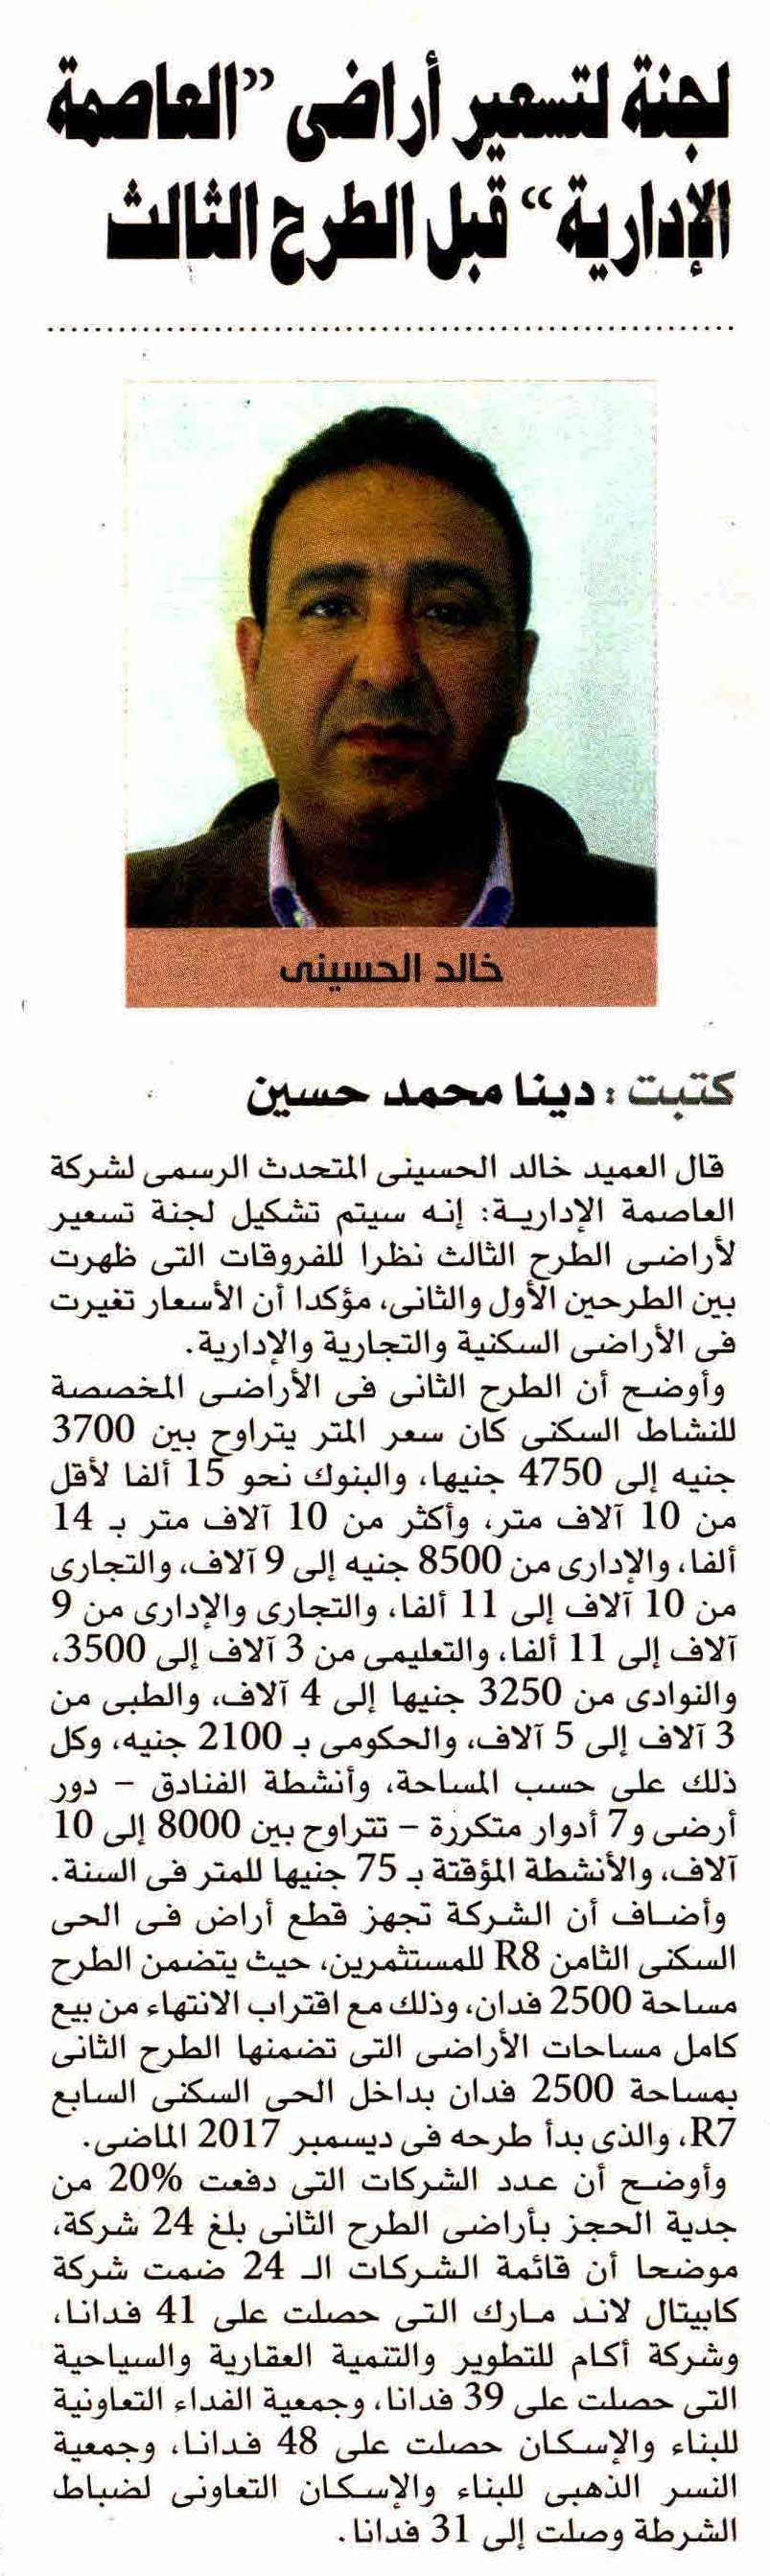 Al Ahram Al Iktisadi 13 May P.11.jpg